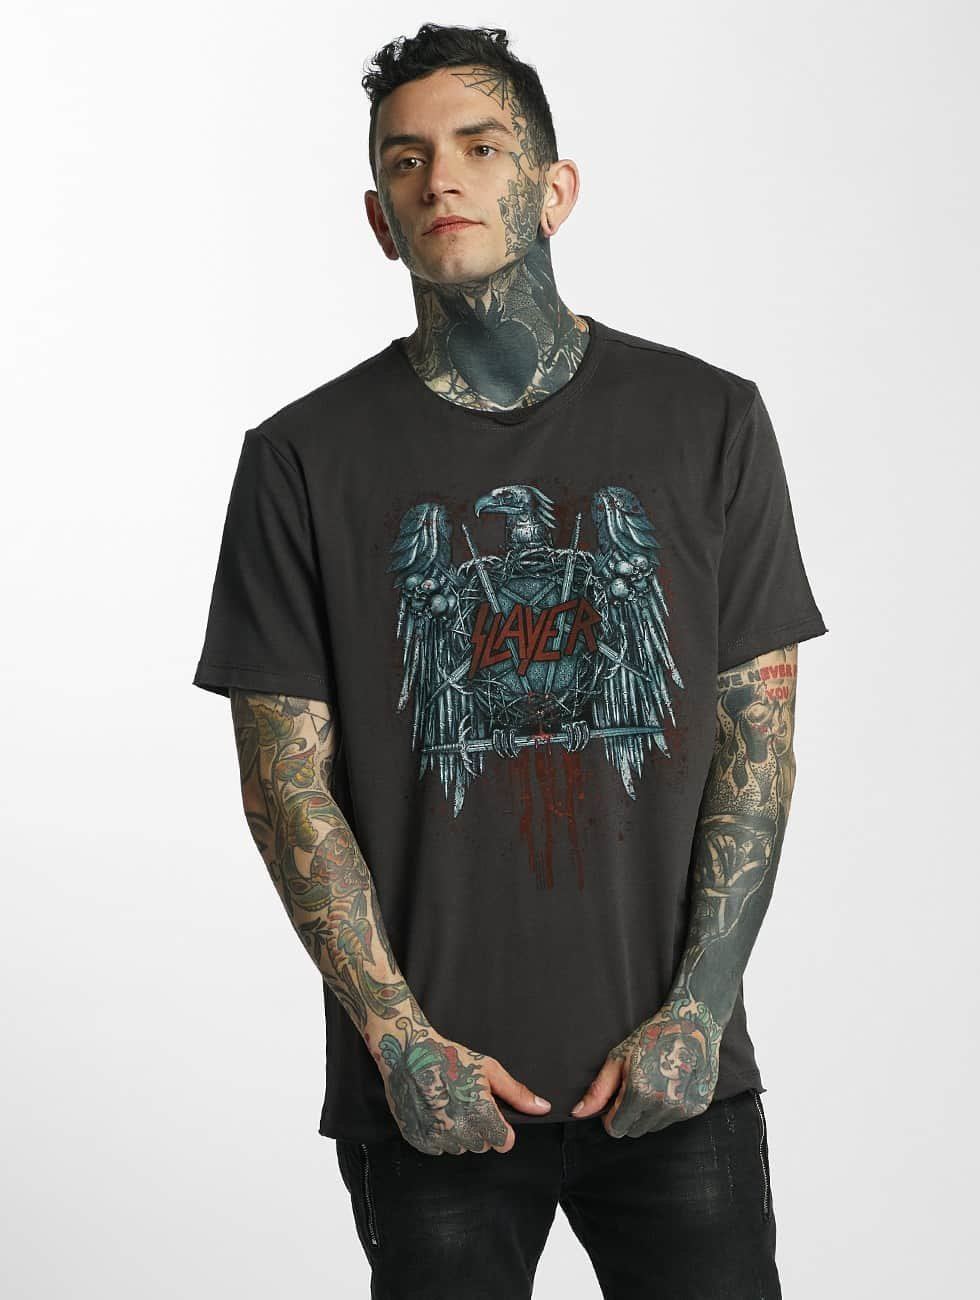 Amplified T-Shirt Slayer Metal Edge gris